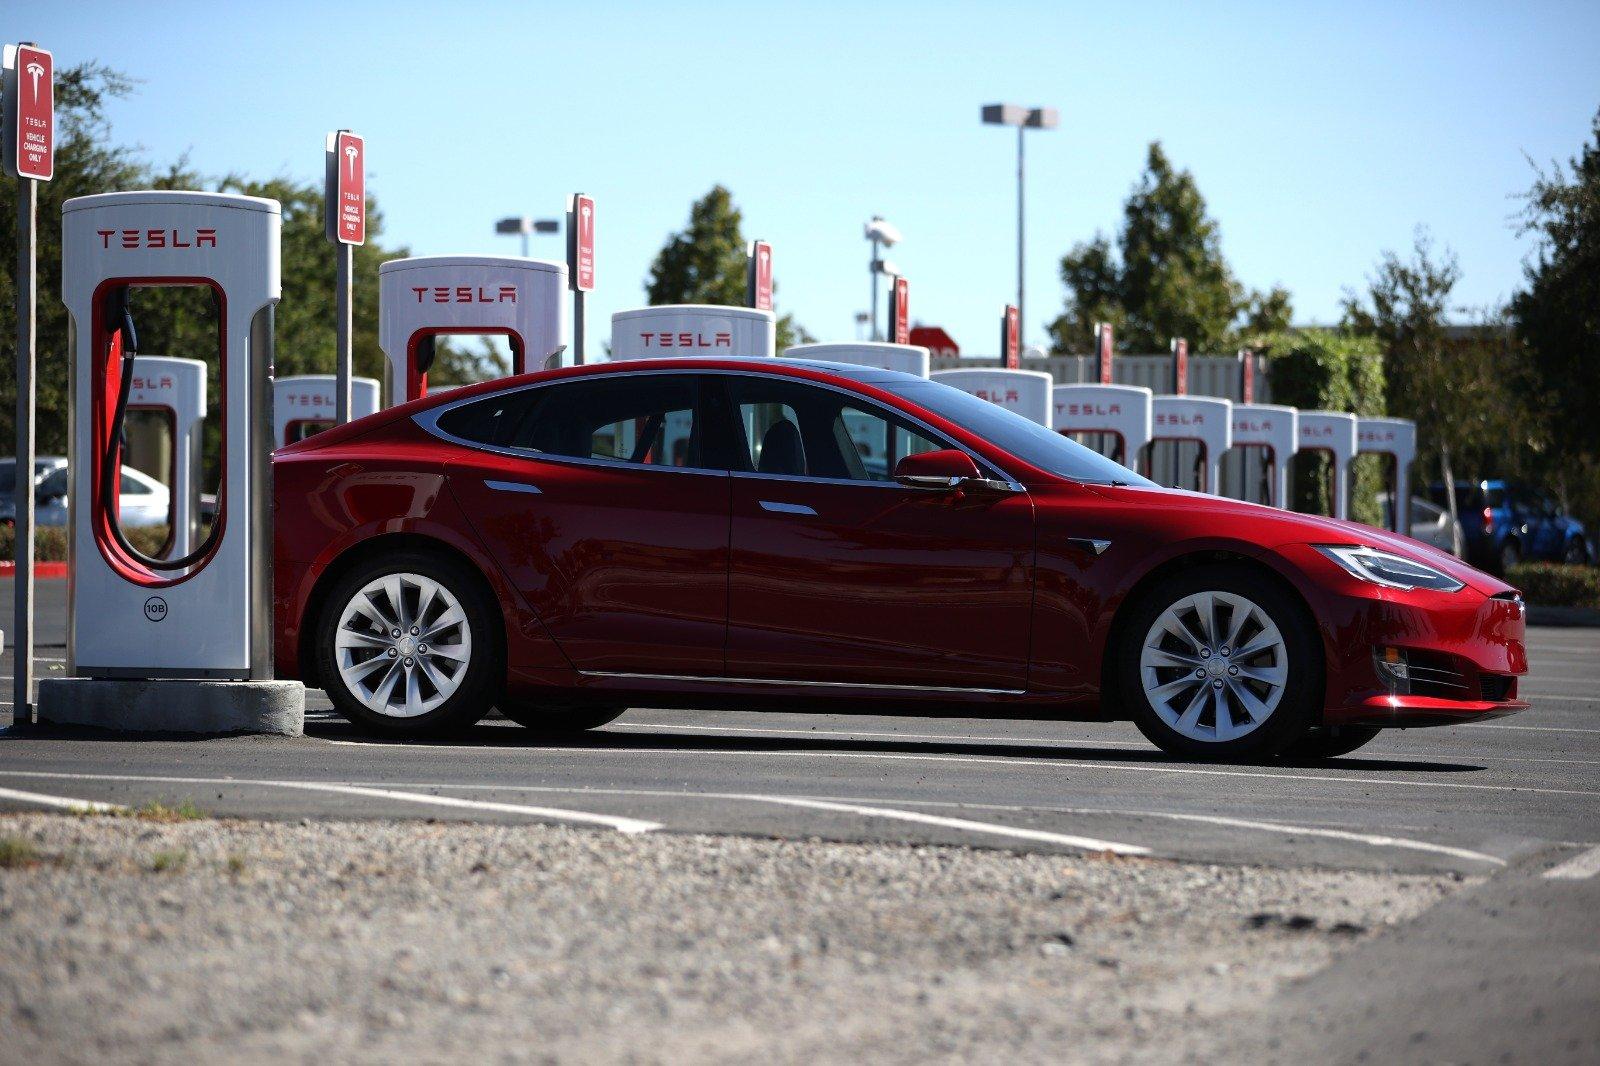 Tesla再下一城,第4季出貨量強勁,環比增長30%,公司市值達6,700億美元,乃車股之冠。(Justin Sullivan/Getty Images)